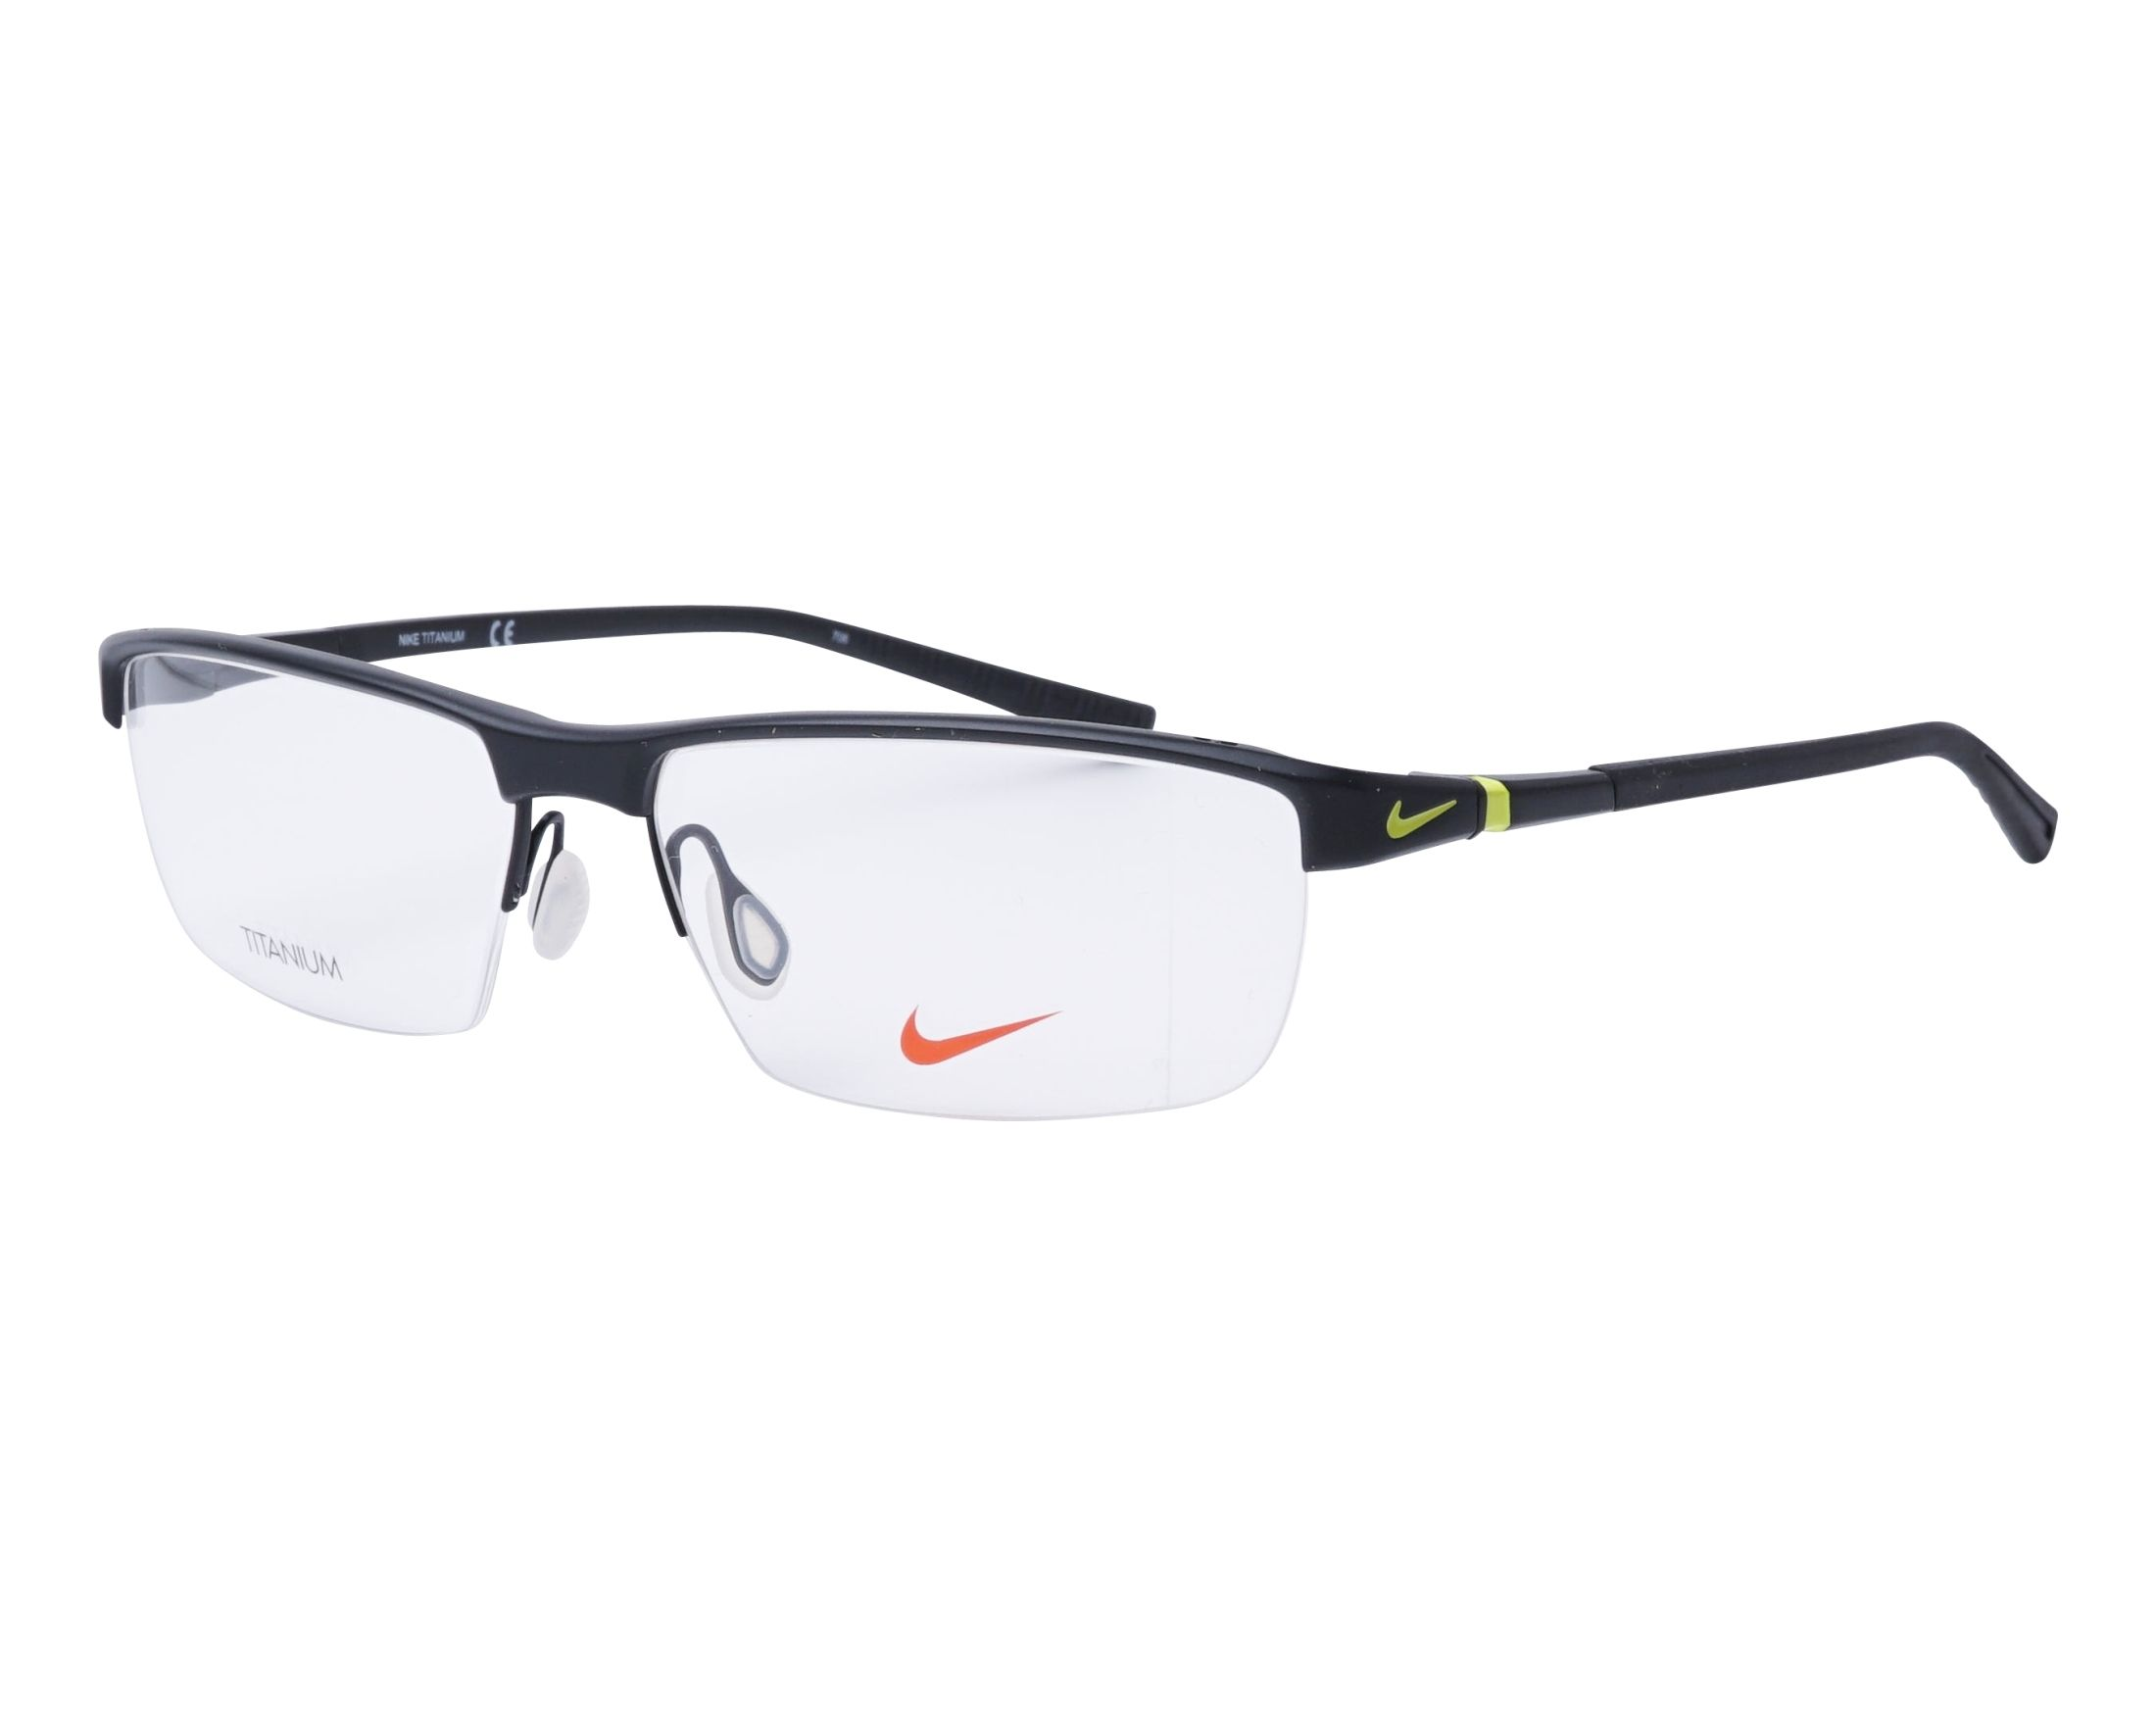 6c7d4cb61eb eyeglasses Nike 6052 002 59-15 Black profile view